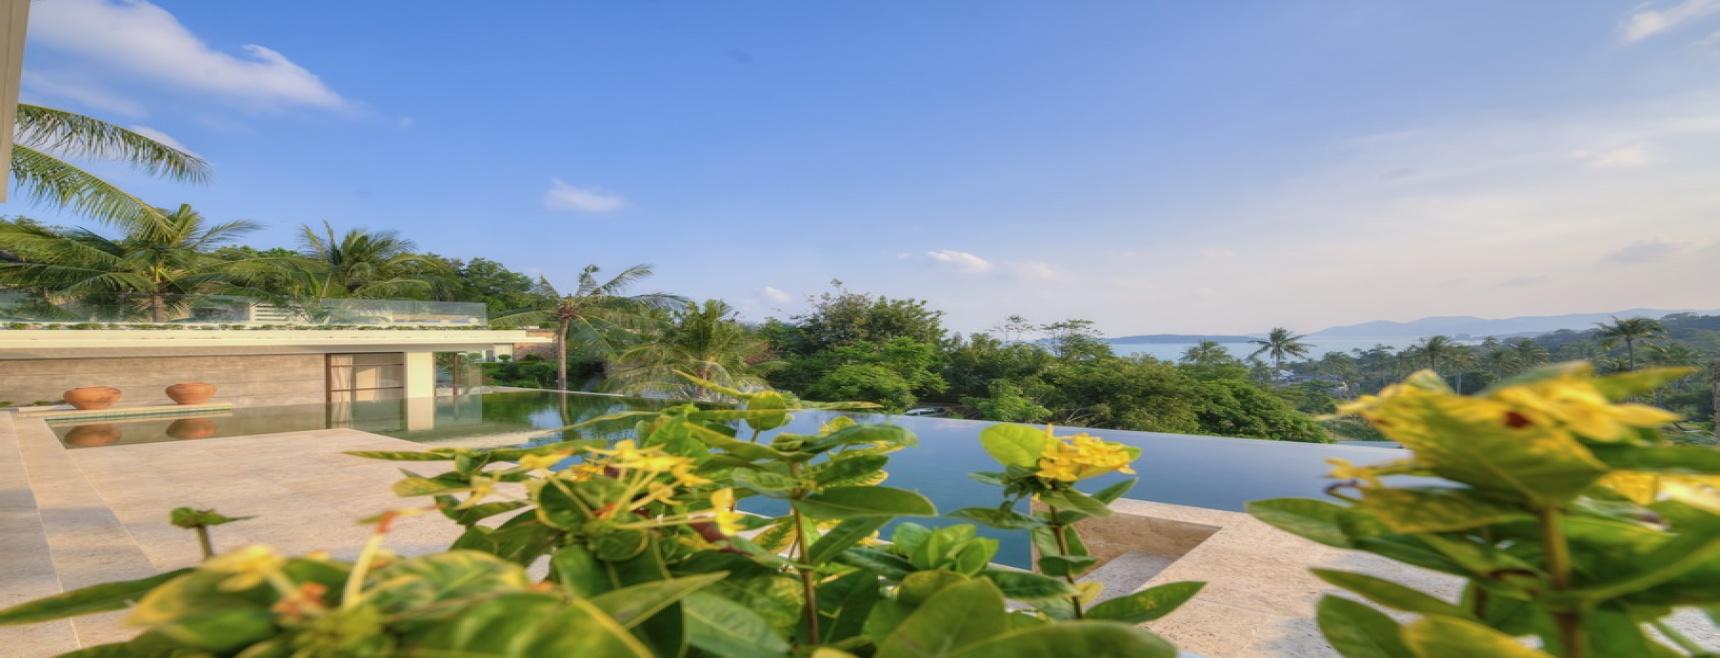 Choeng Mon, North East, Koh Samui, 6 Bedrooms Bedrooms, 2 Rooms Rooms,Villa,Holiday Villa Rentals,1534